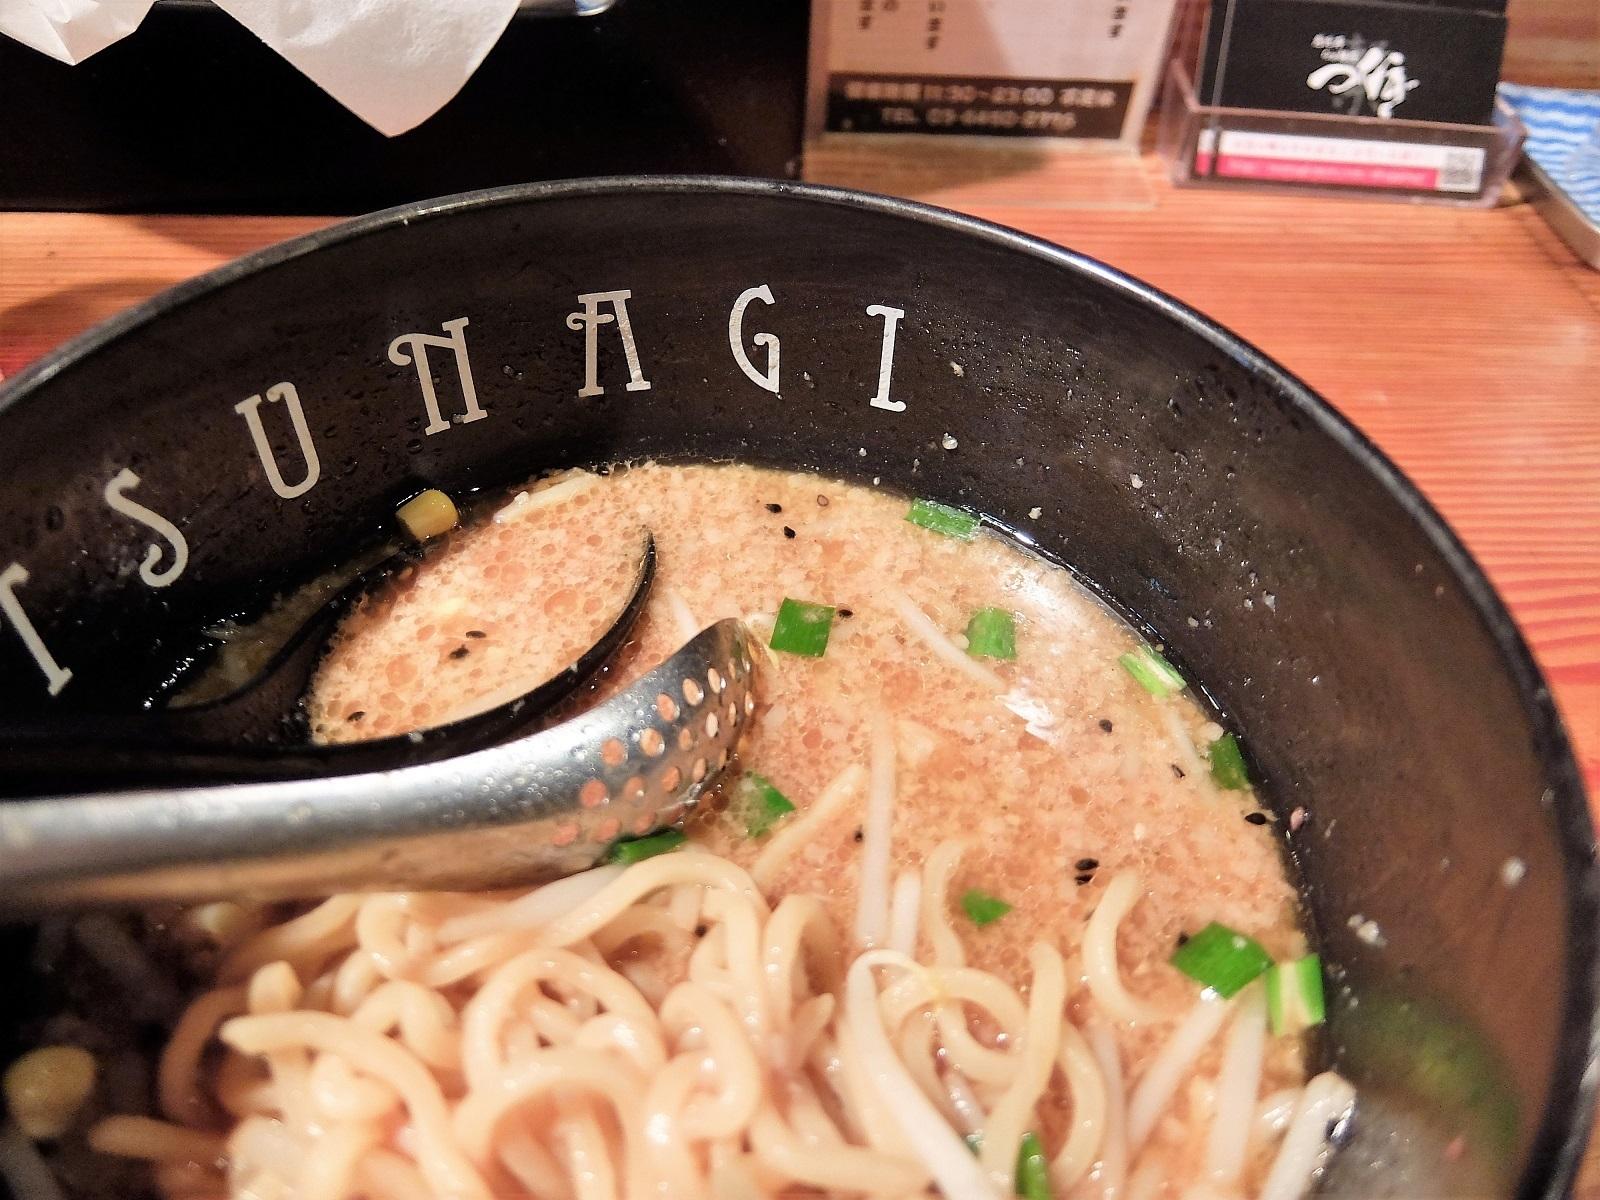 tsunagi3a.jpg